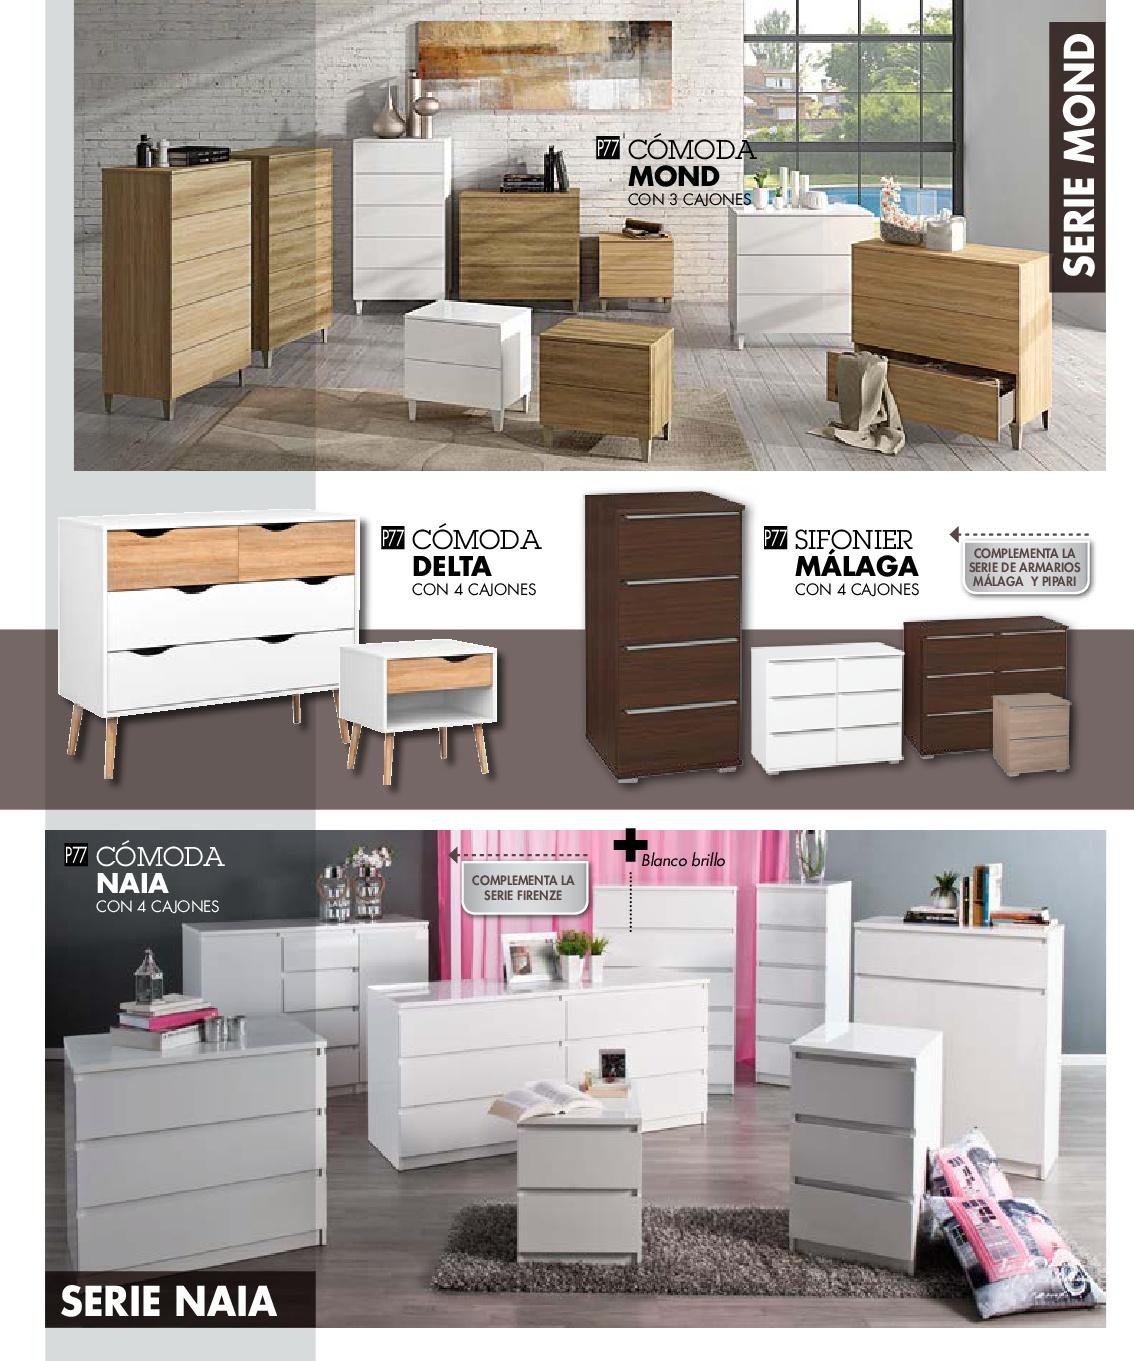 Conforama armarios 201678 - Catalogo armarios conforama ...